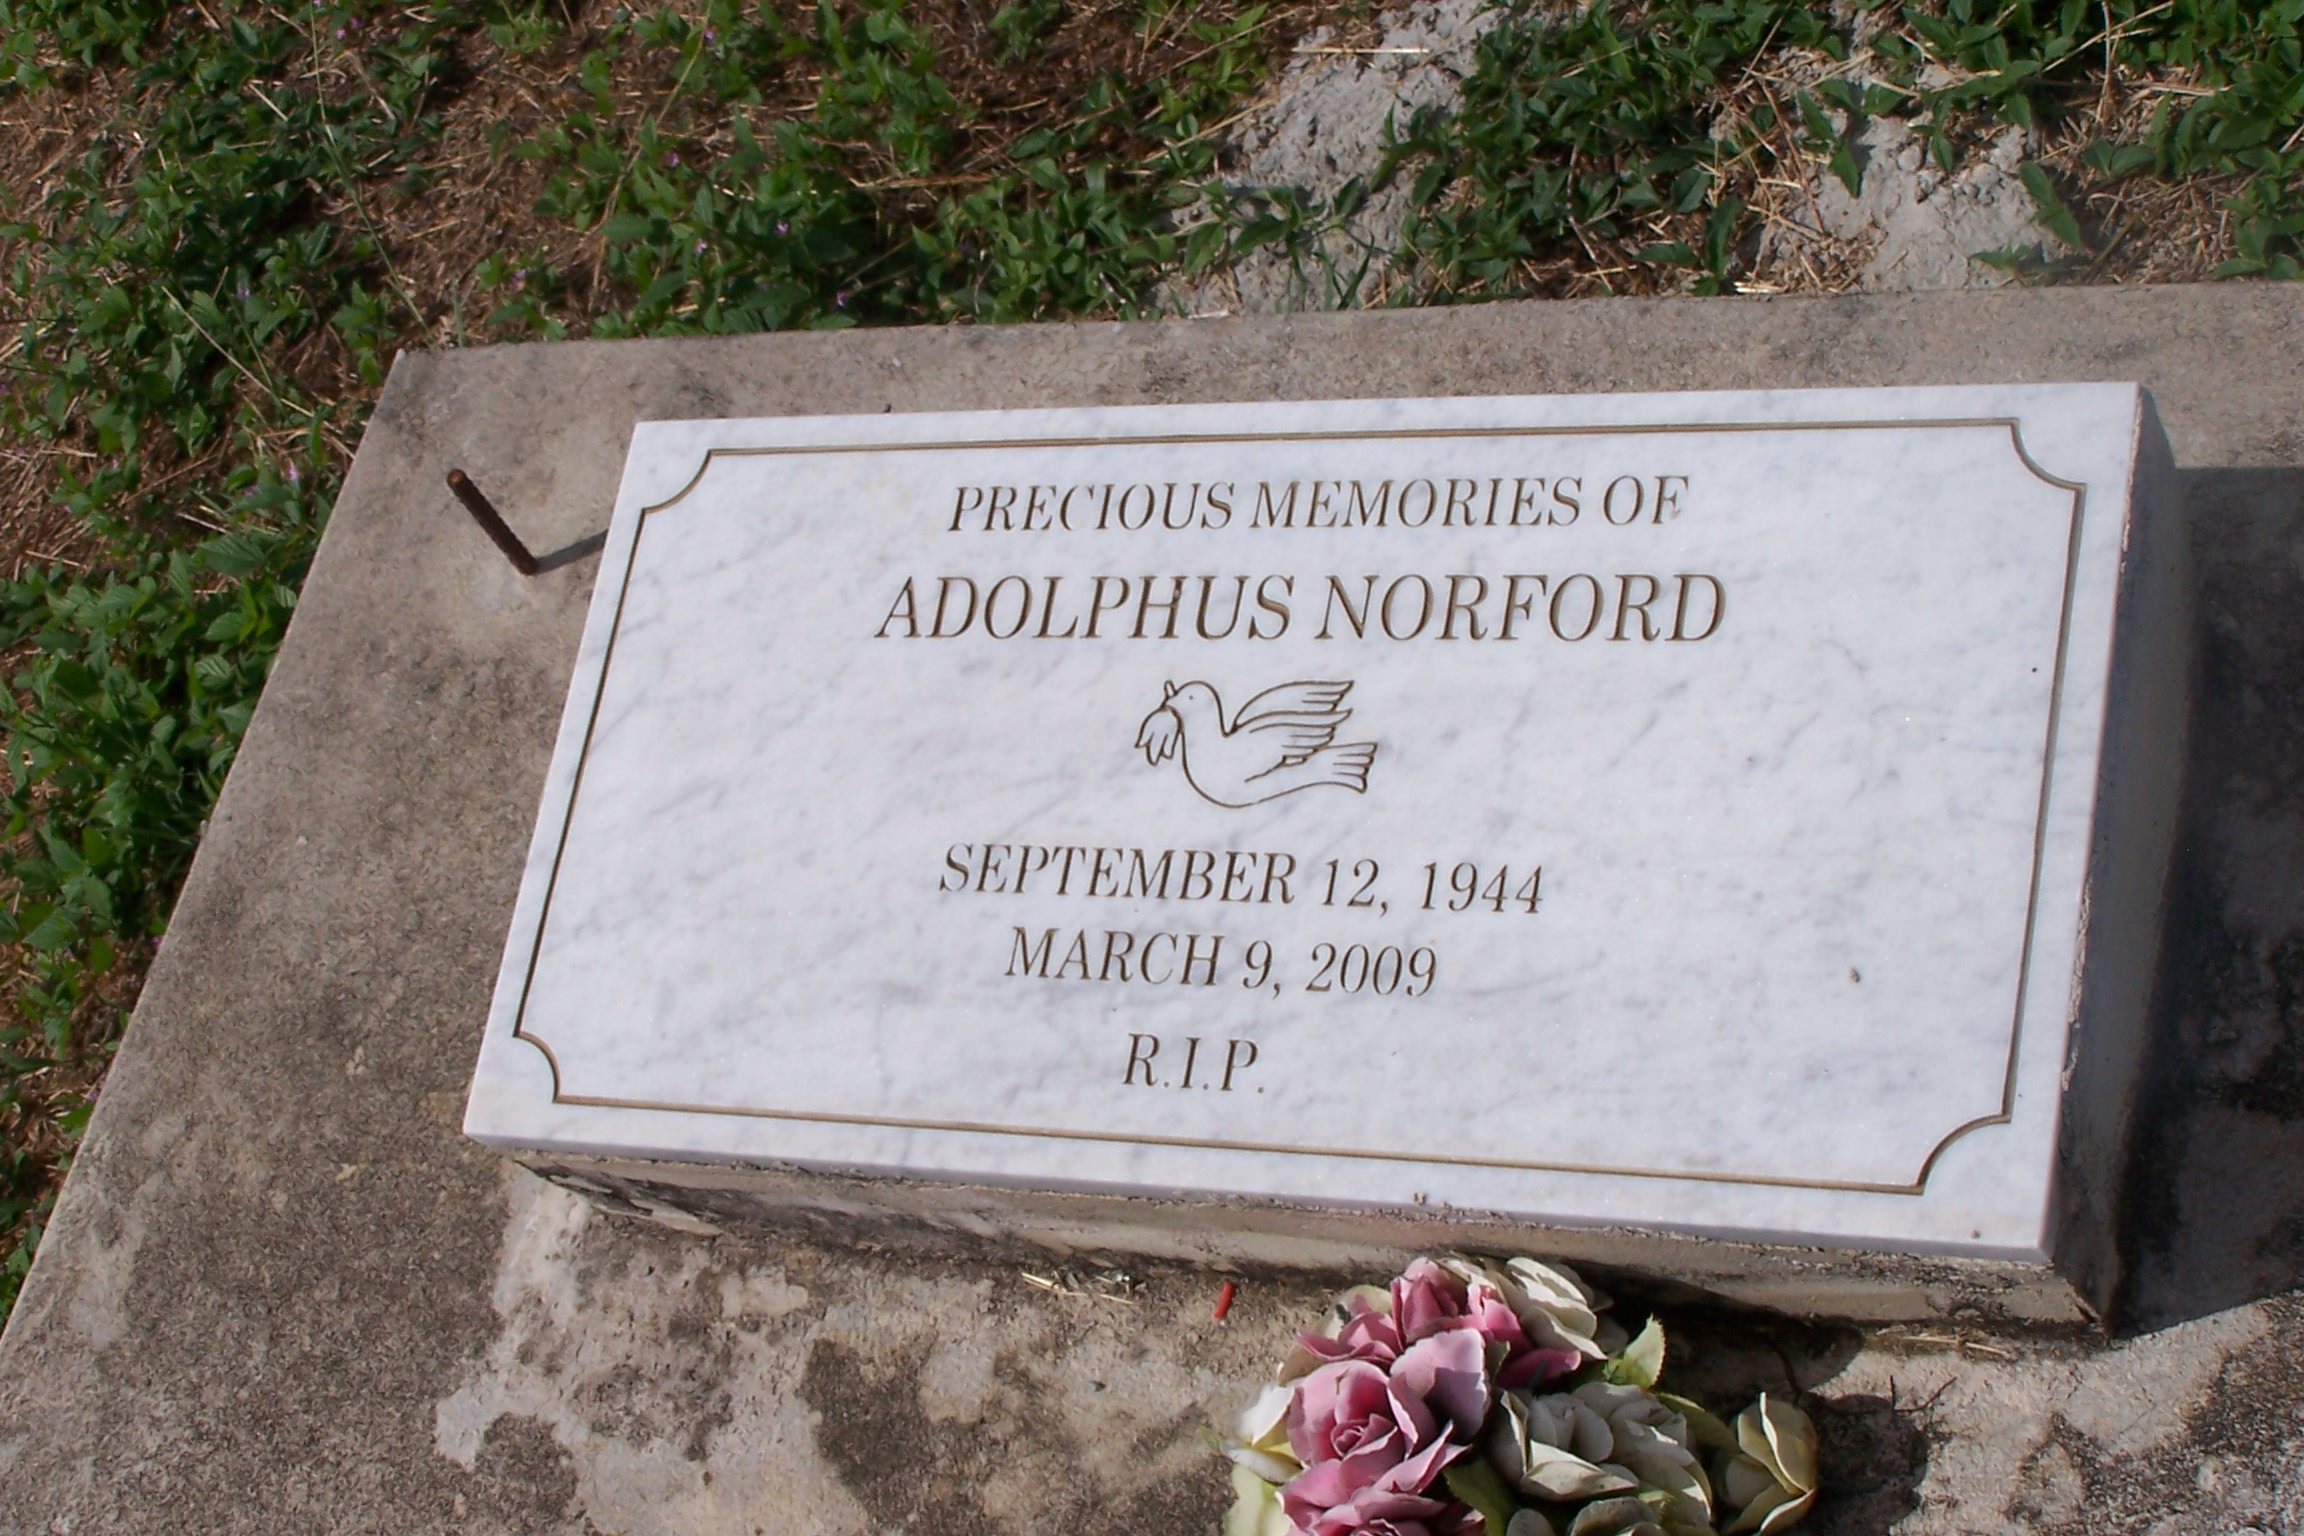 Adolphus Norford